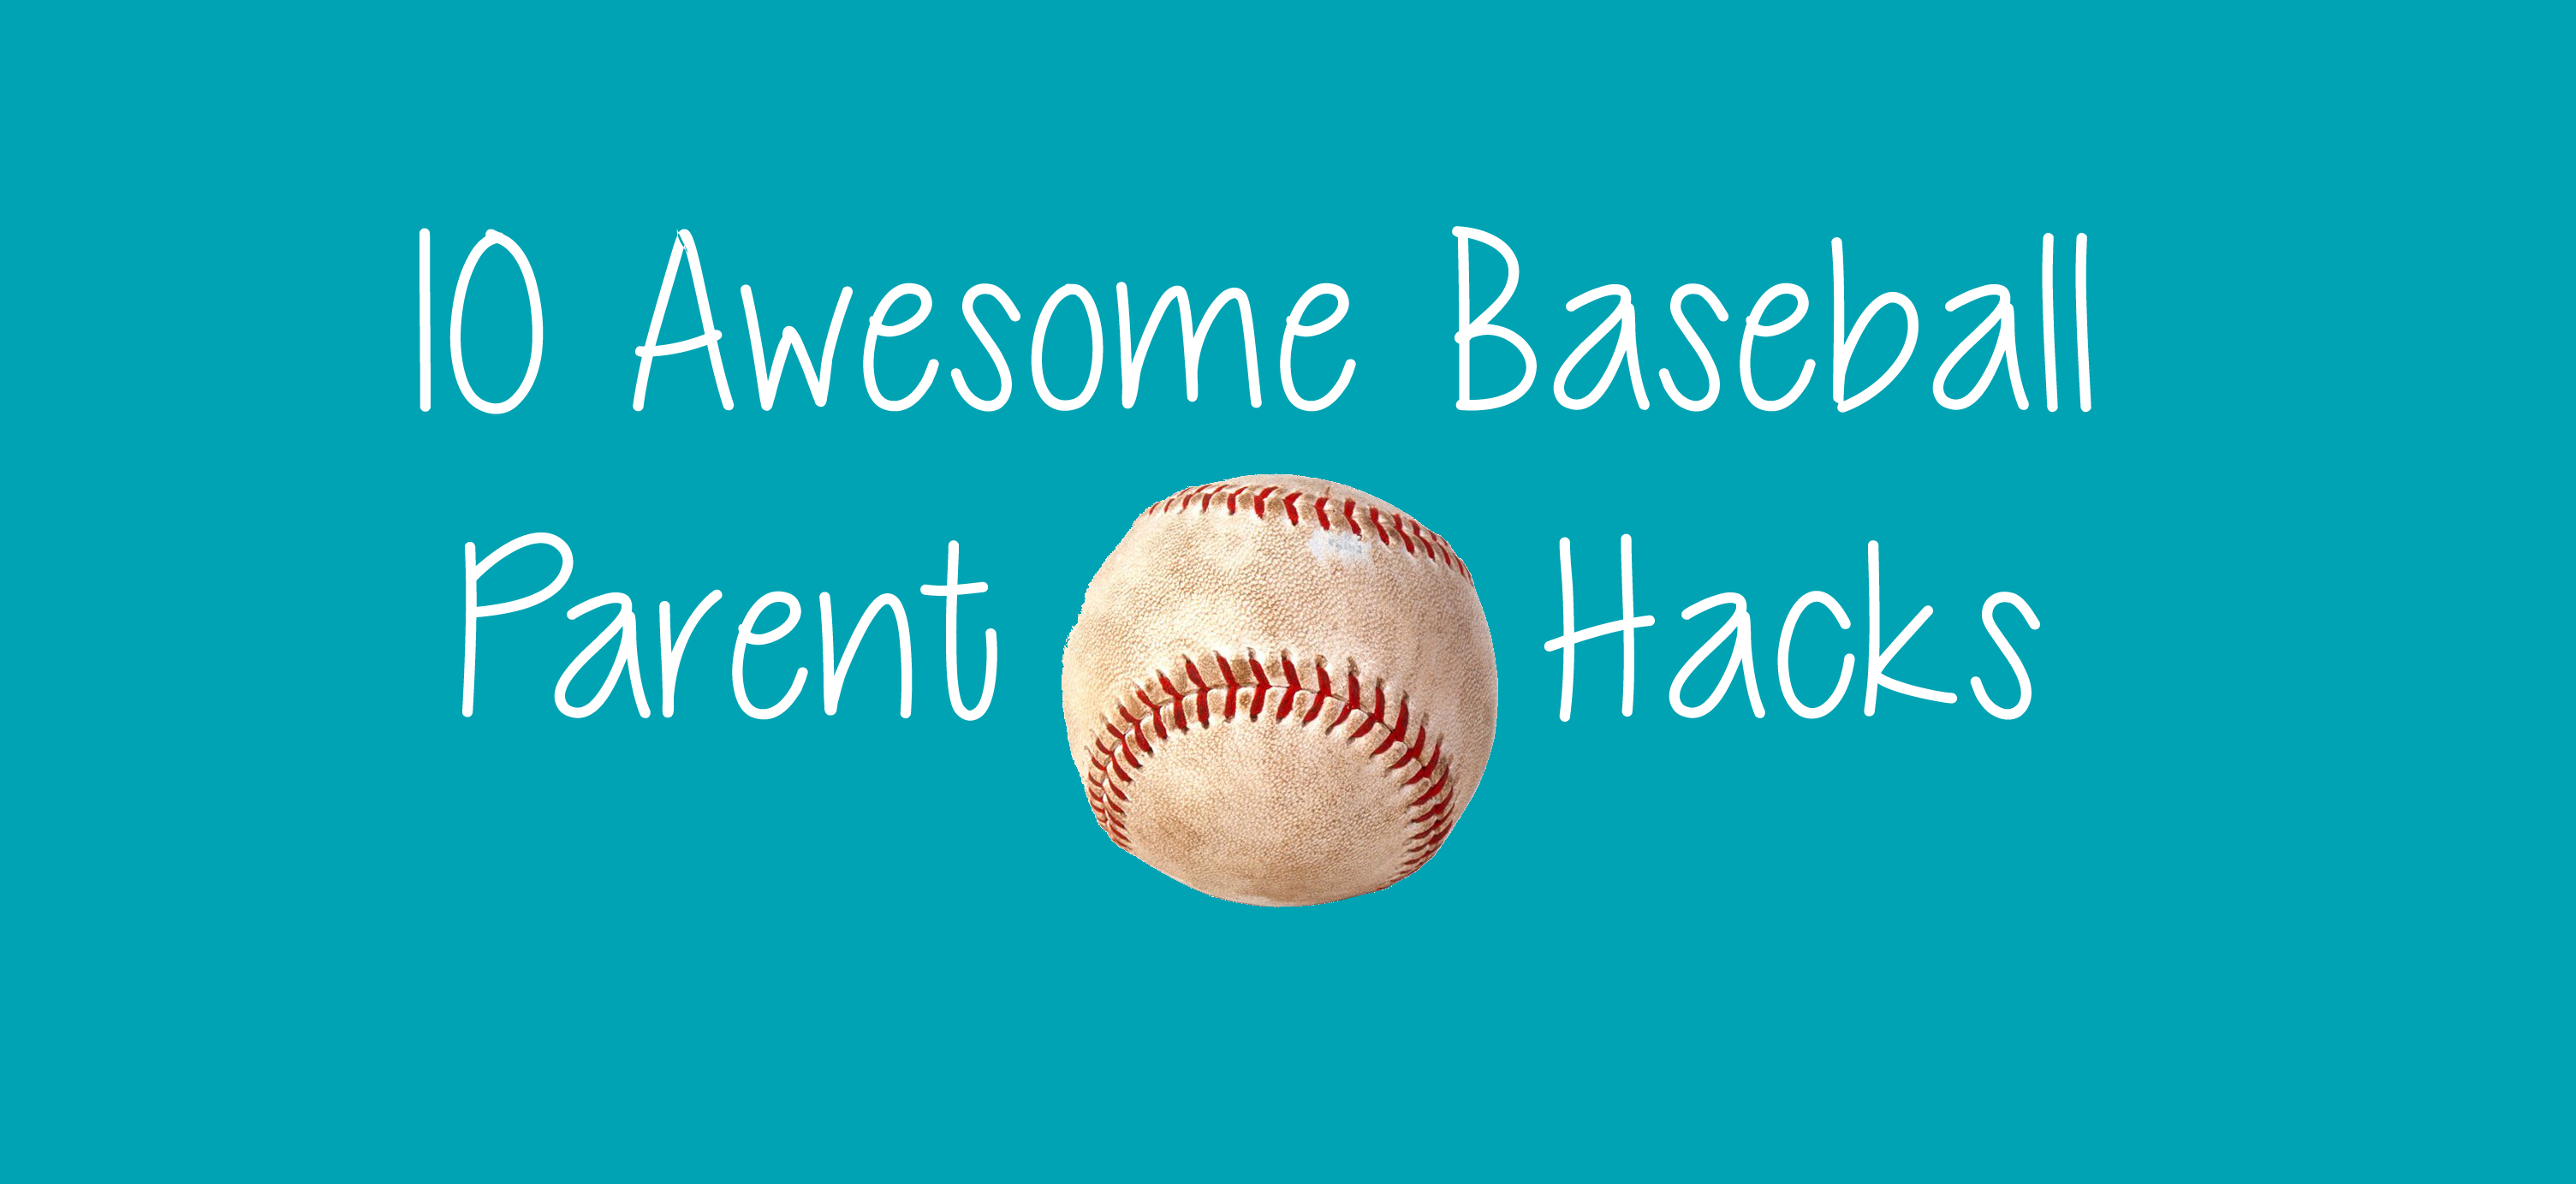 10 Awesome Baseball Parent Hacks